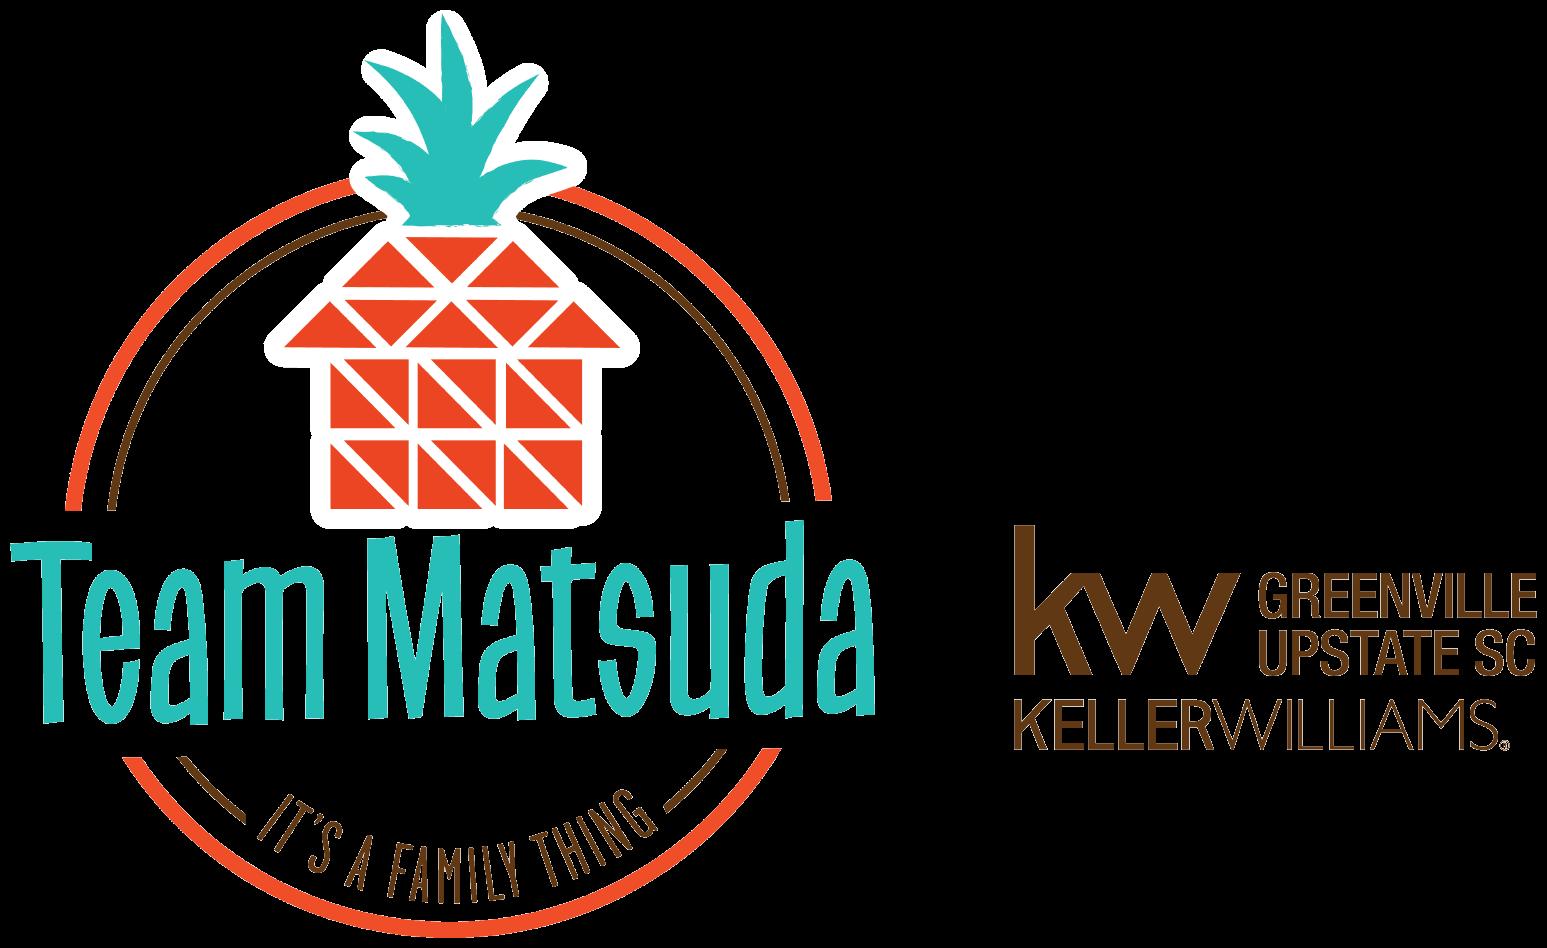 Team Matsuda | KW Greenville Upstate SC